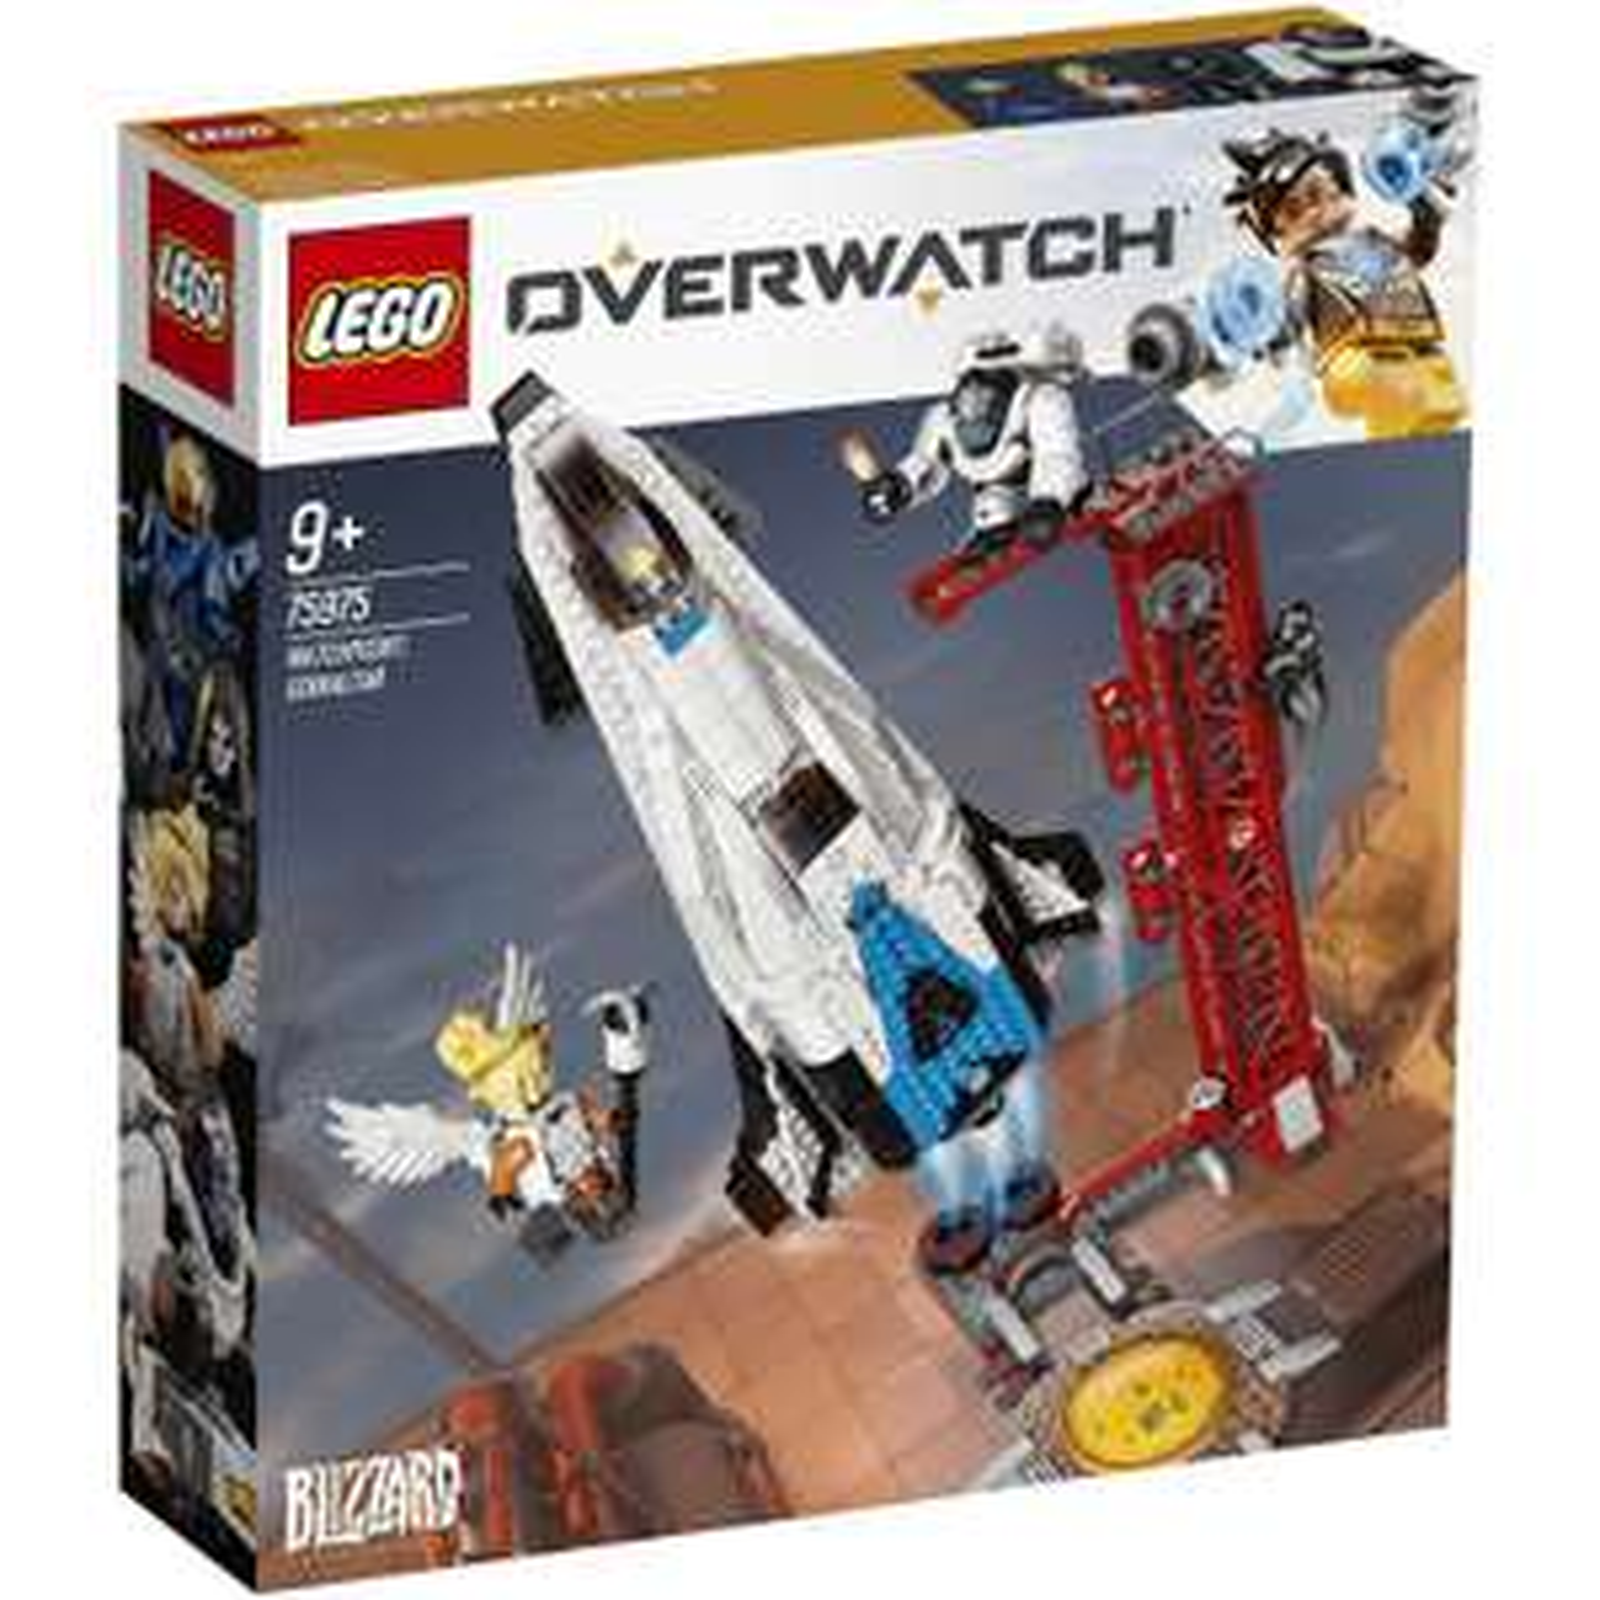 LEGO 75975 Overwatch Watchpoint: Gibraltar £59.99 at Amazon